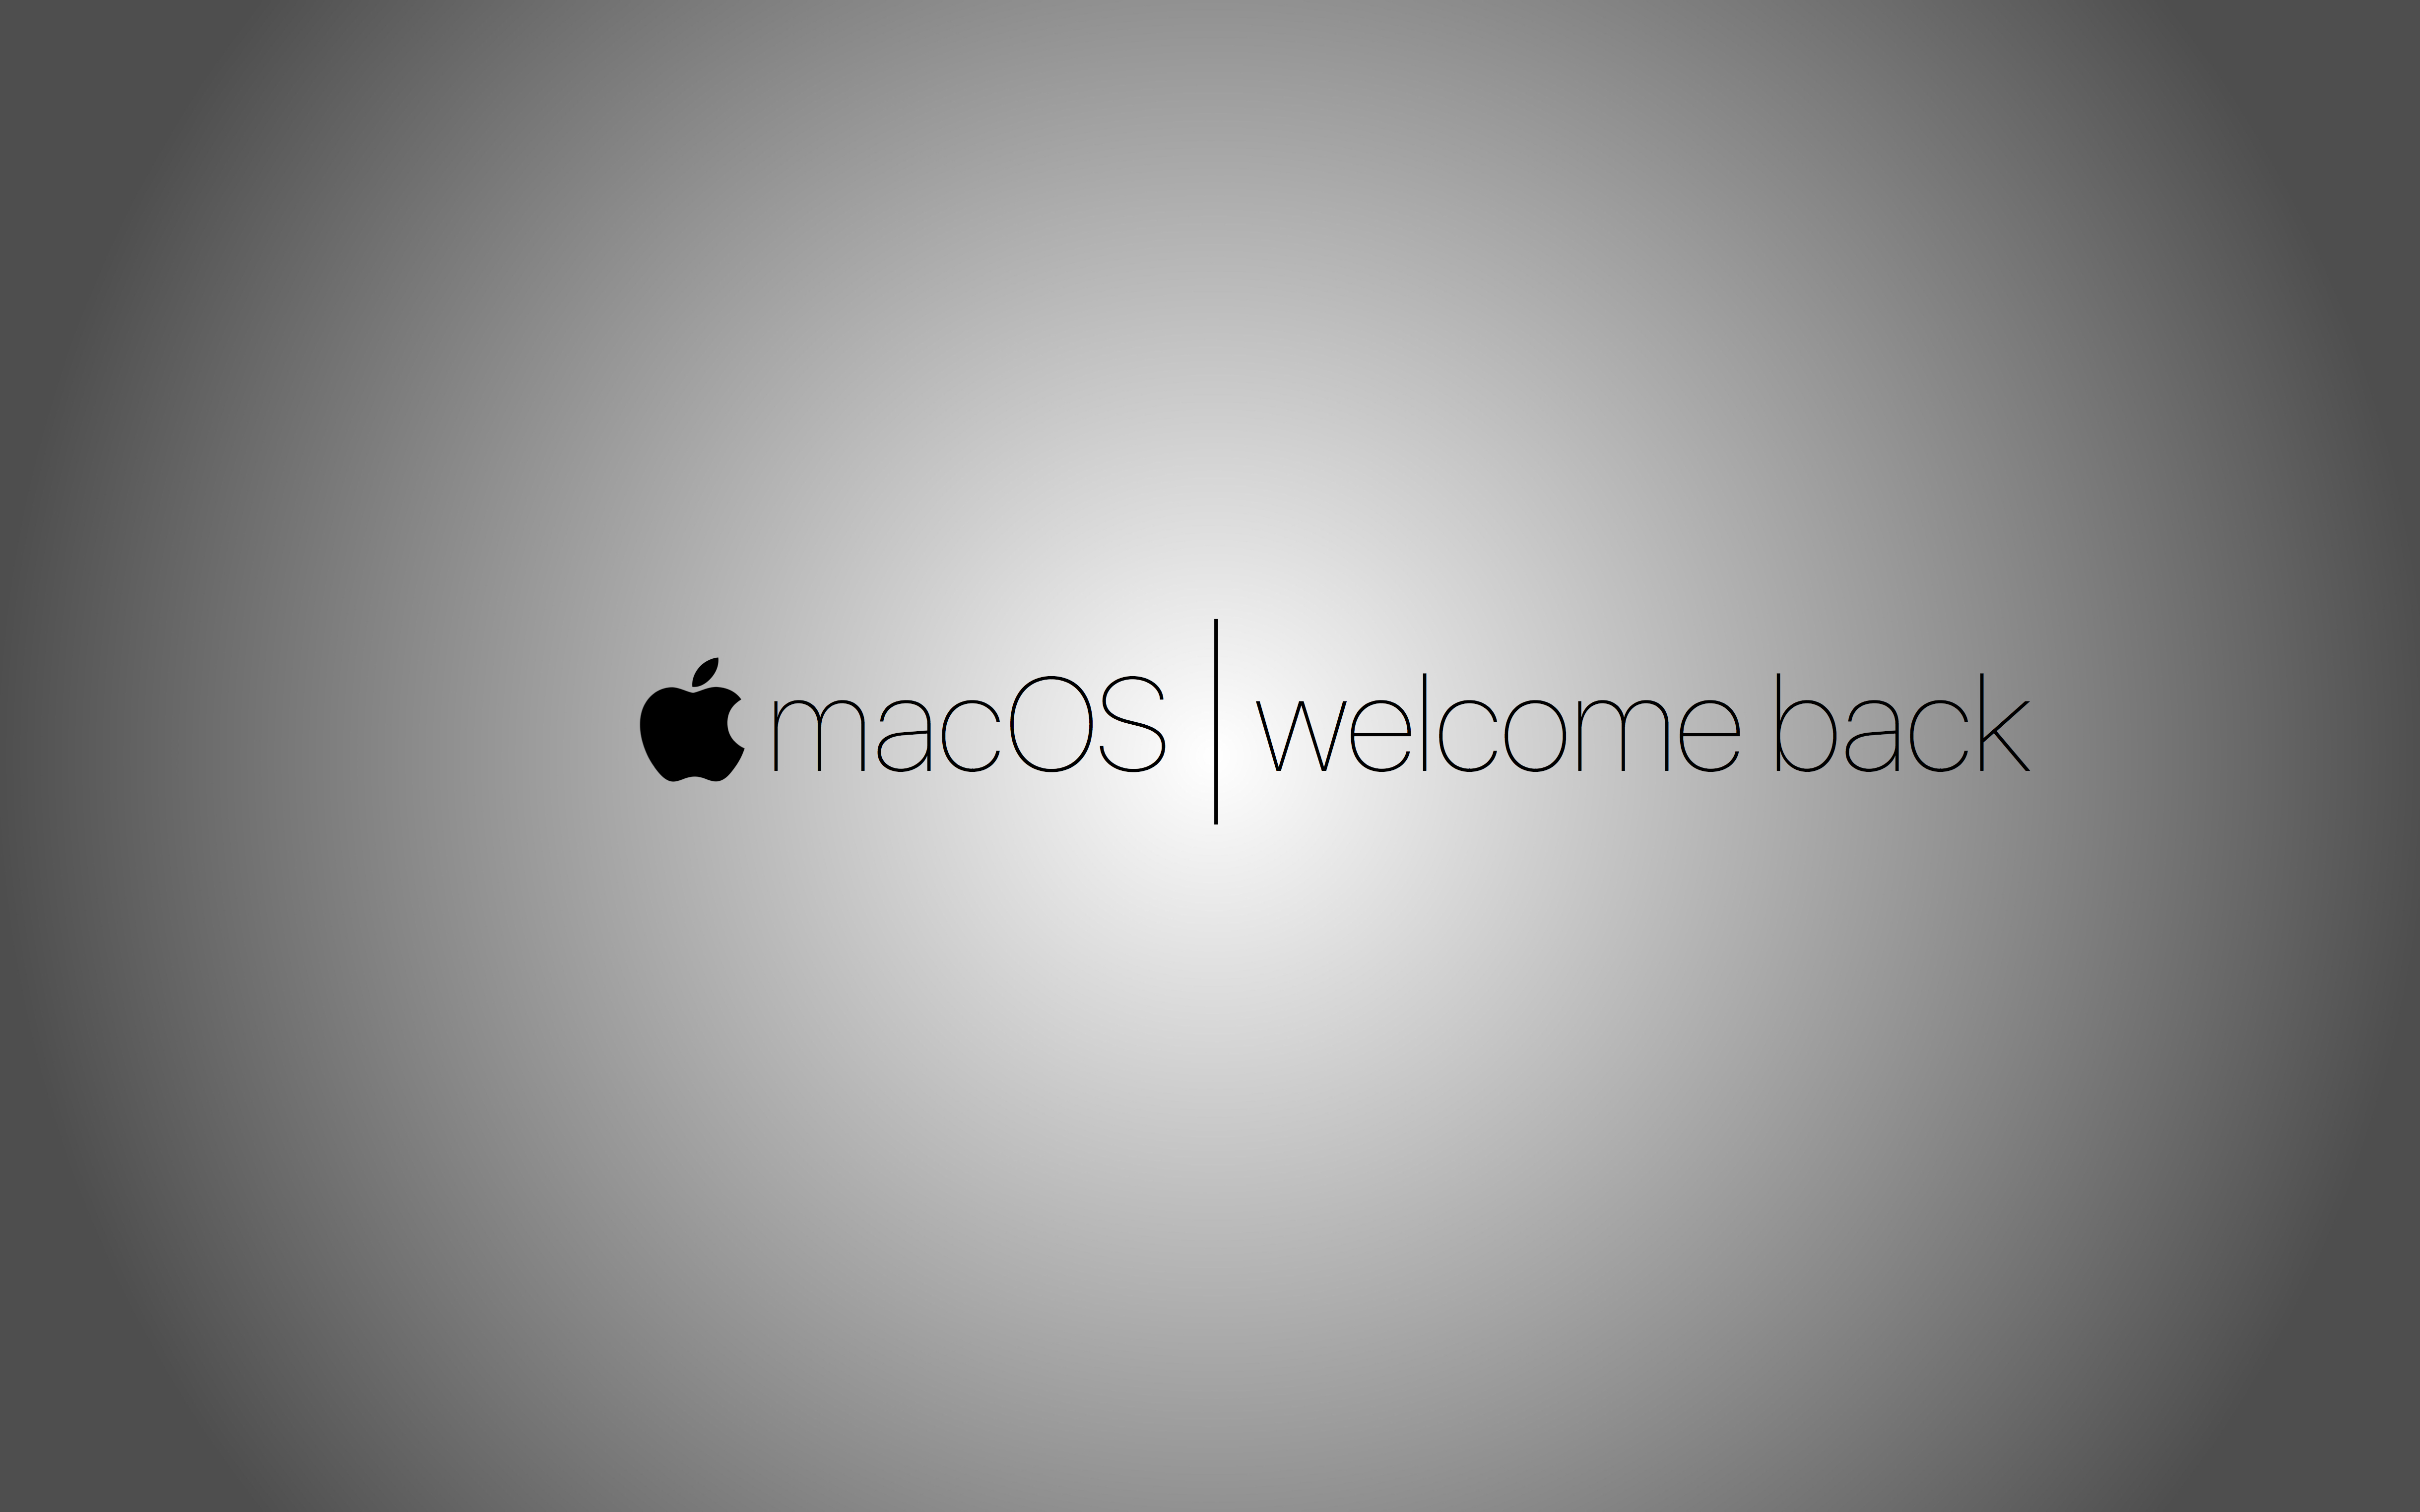 macOS | Welcome back - sg.jpg